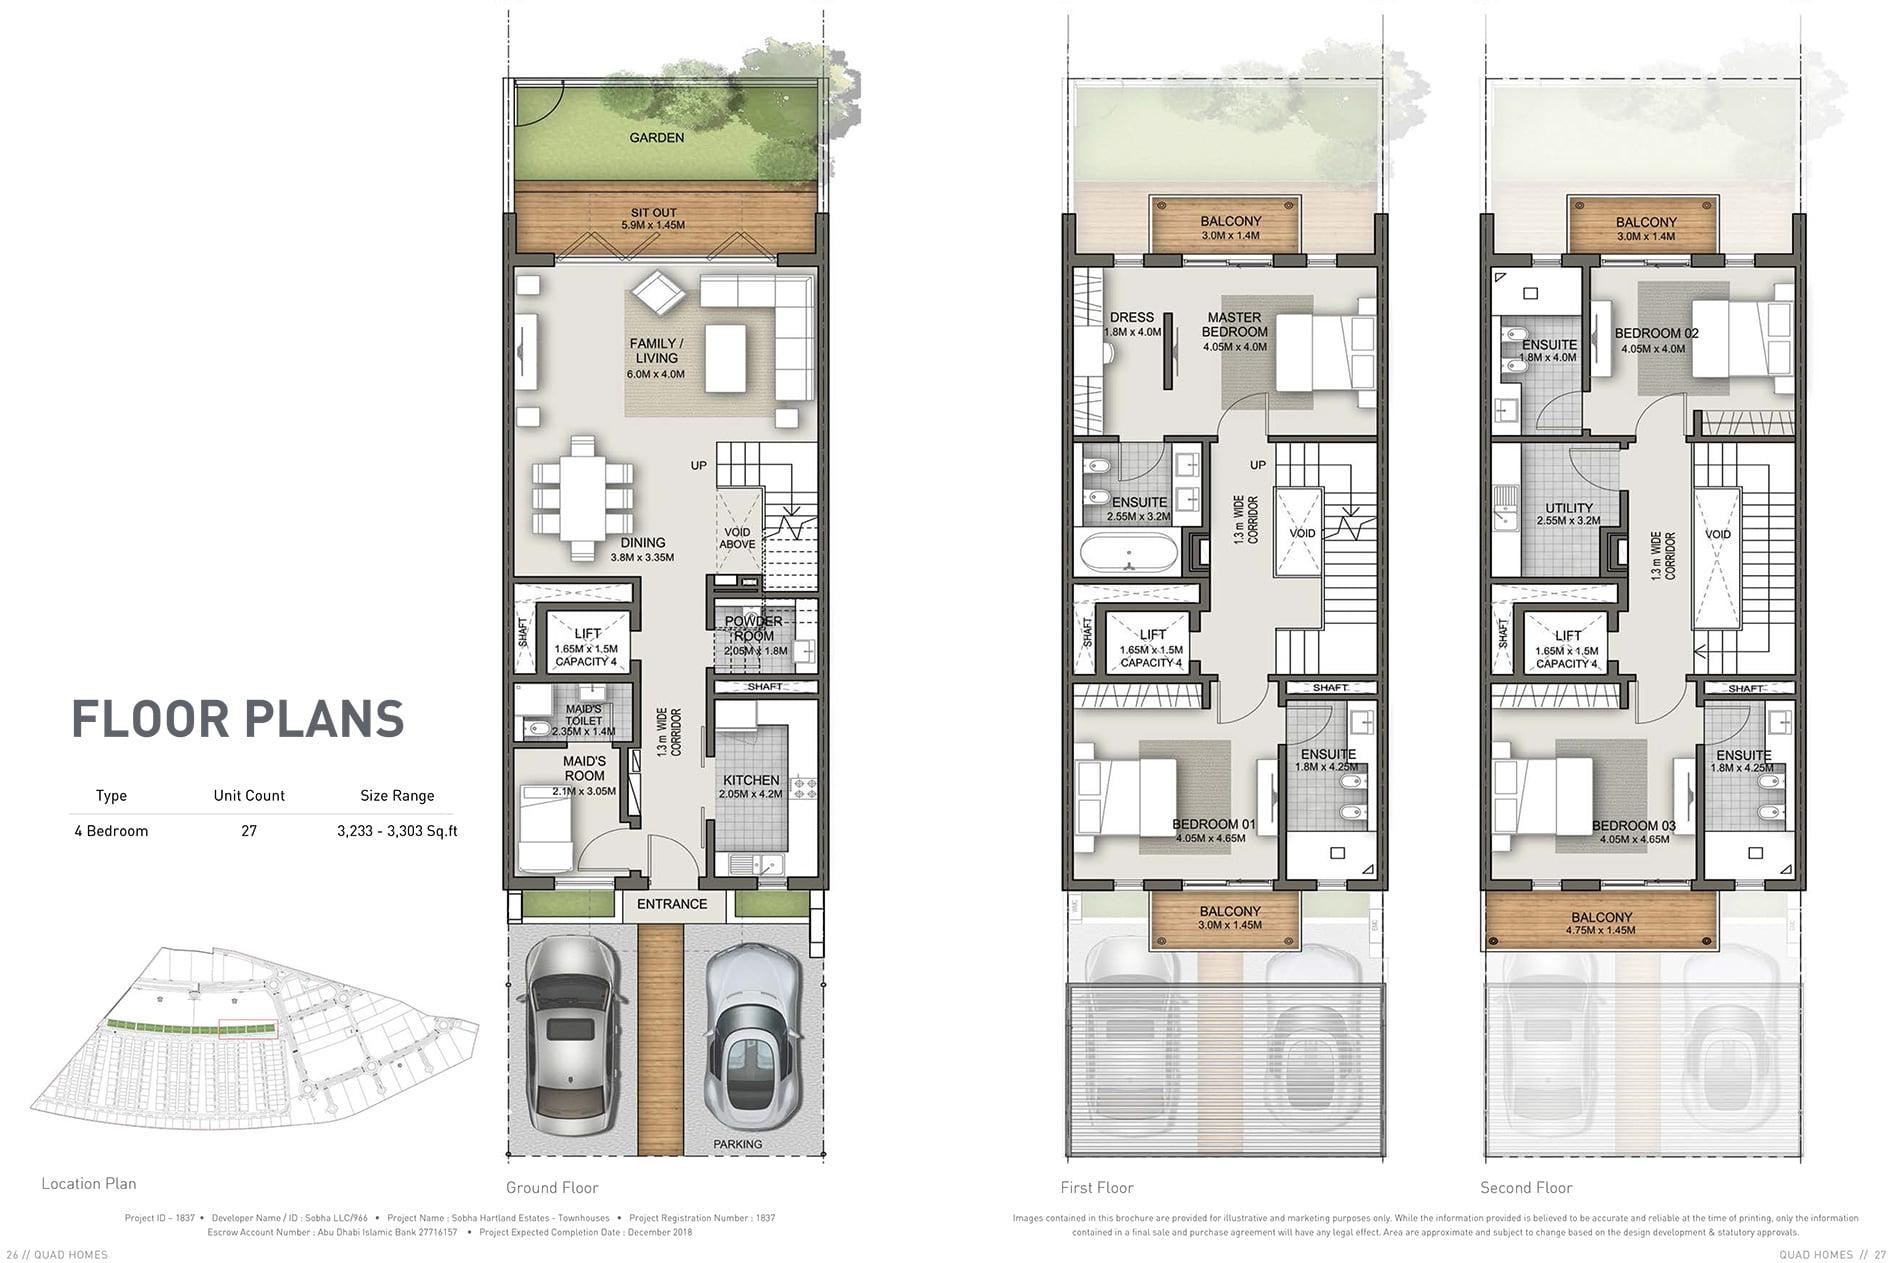 Quad Homes Floor Plans - Quad Homes Sobha Hartland Floor Plans